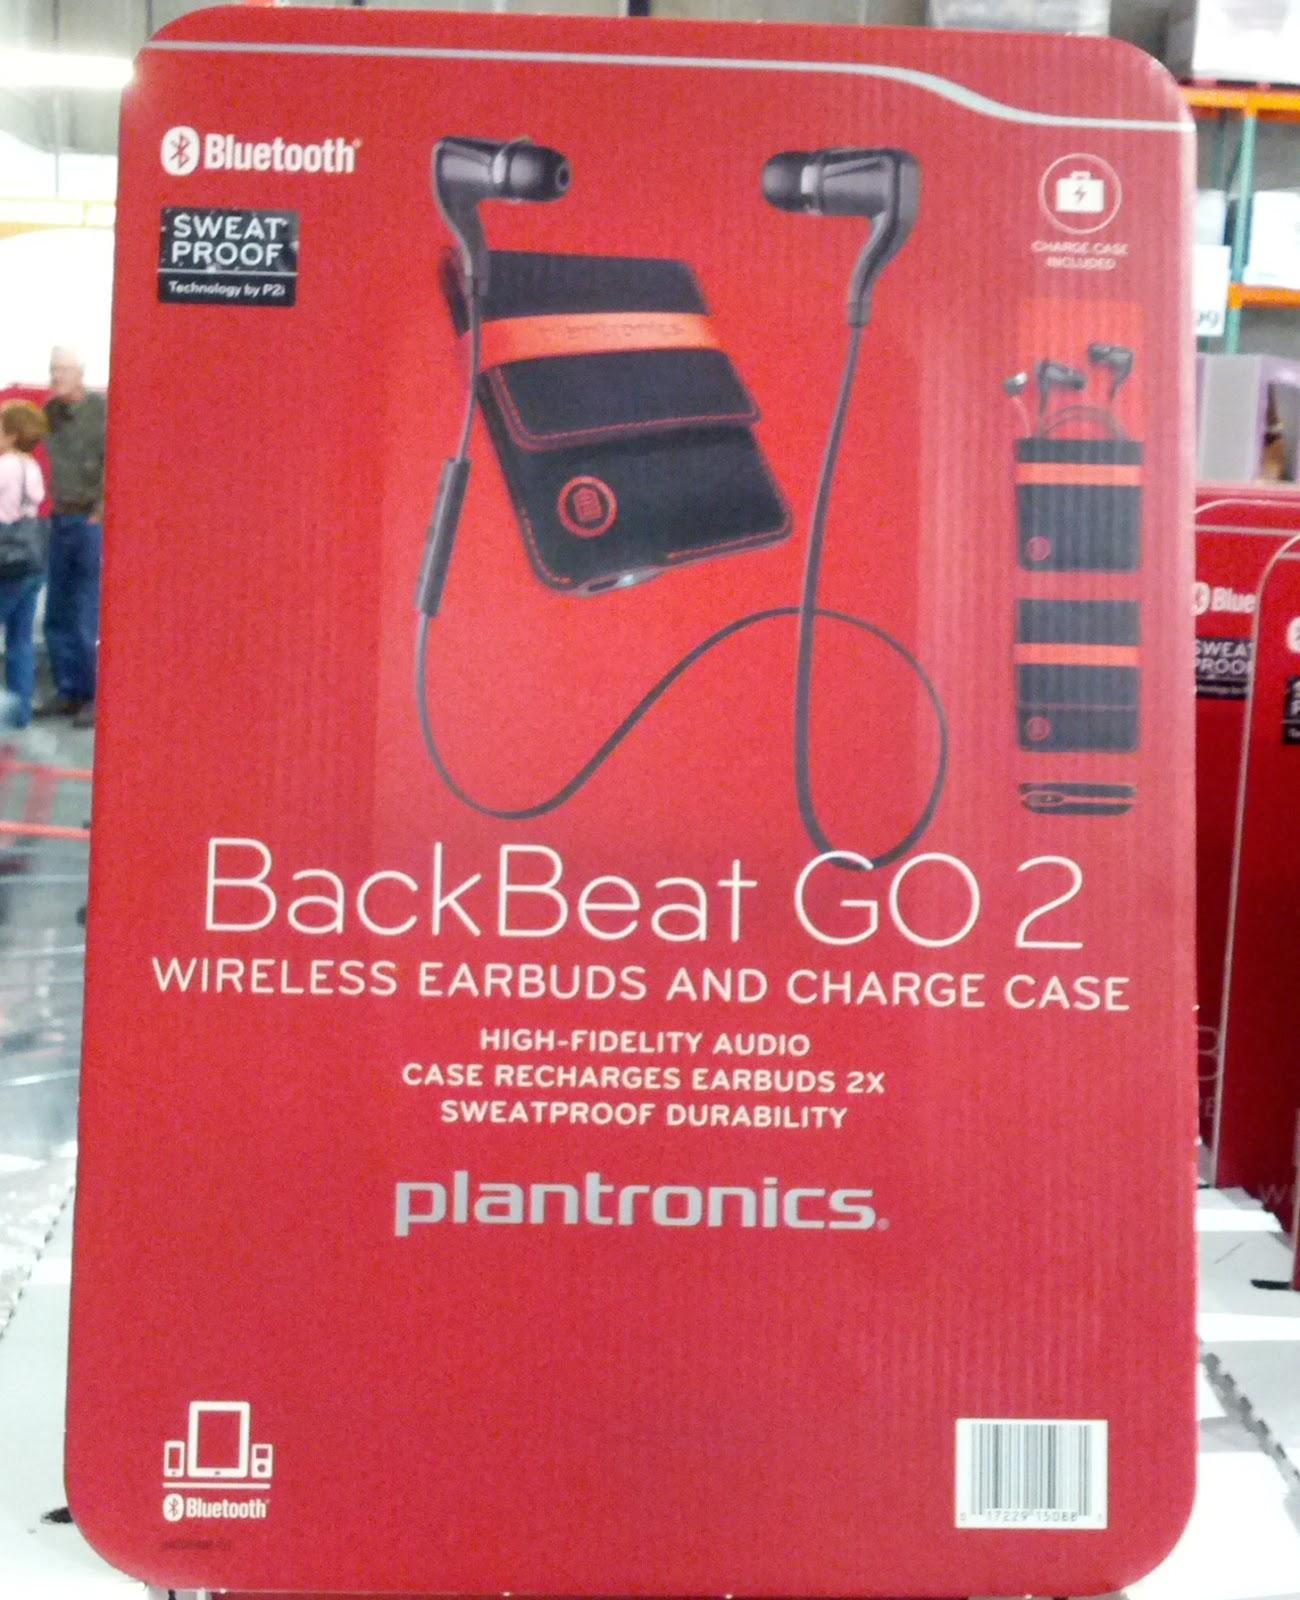 plantronics backbeat go 2 charging instructions